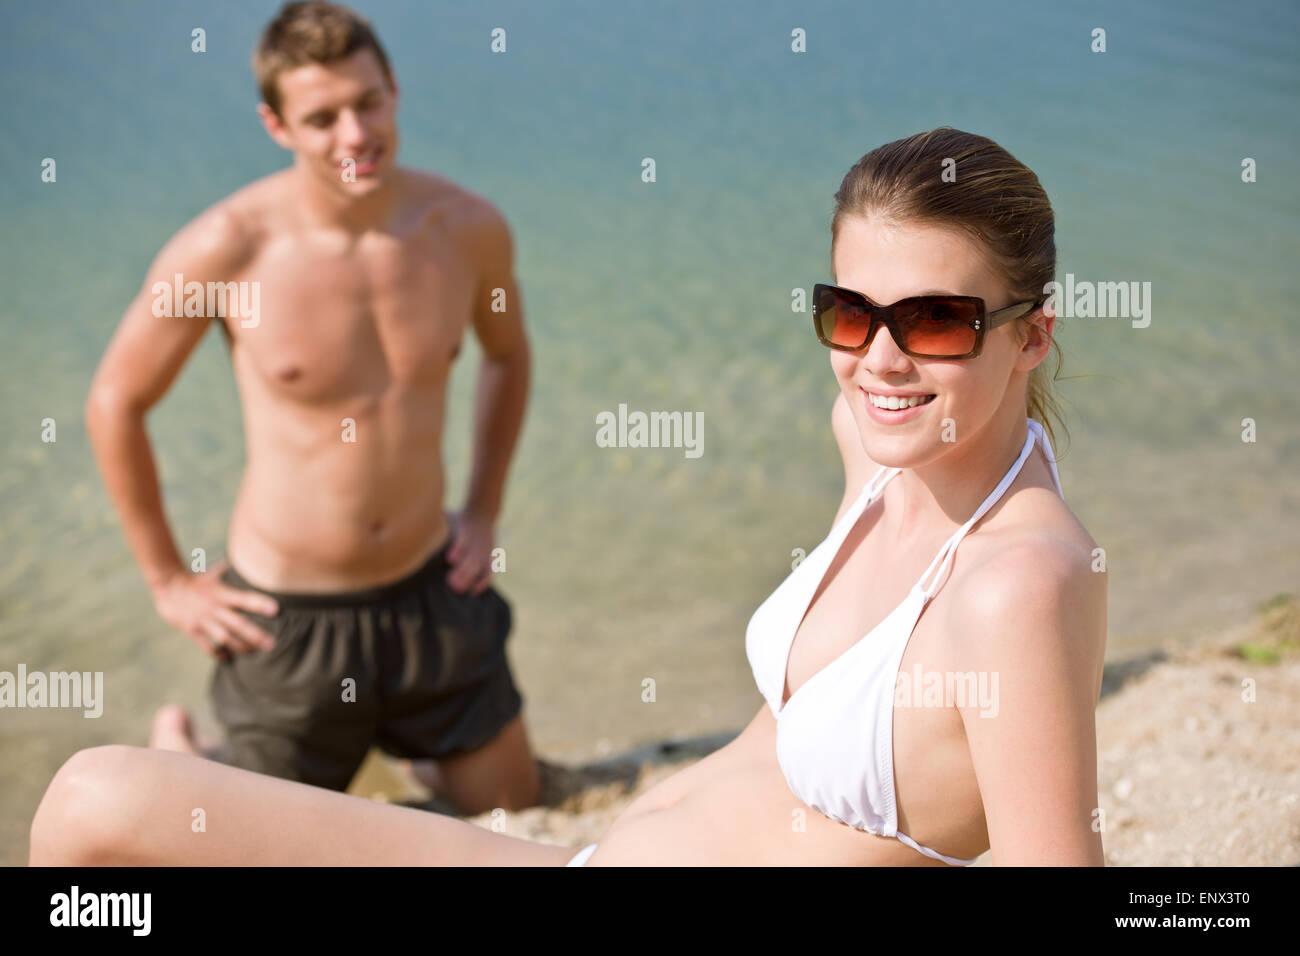 Paar am Strand - Frau im Bikini Sonnen Stockbild